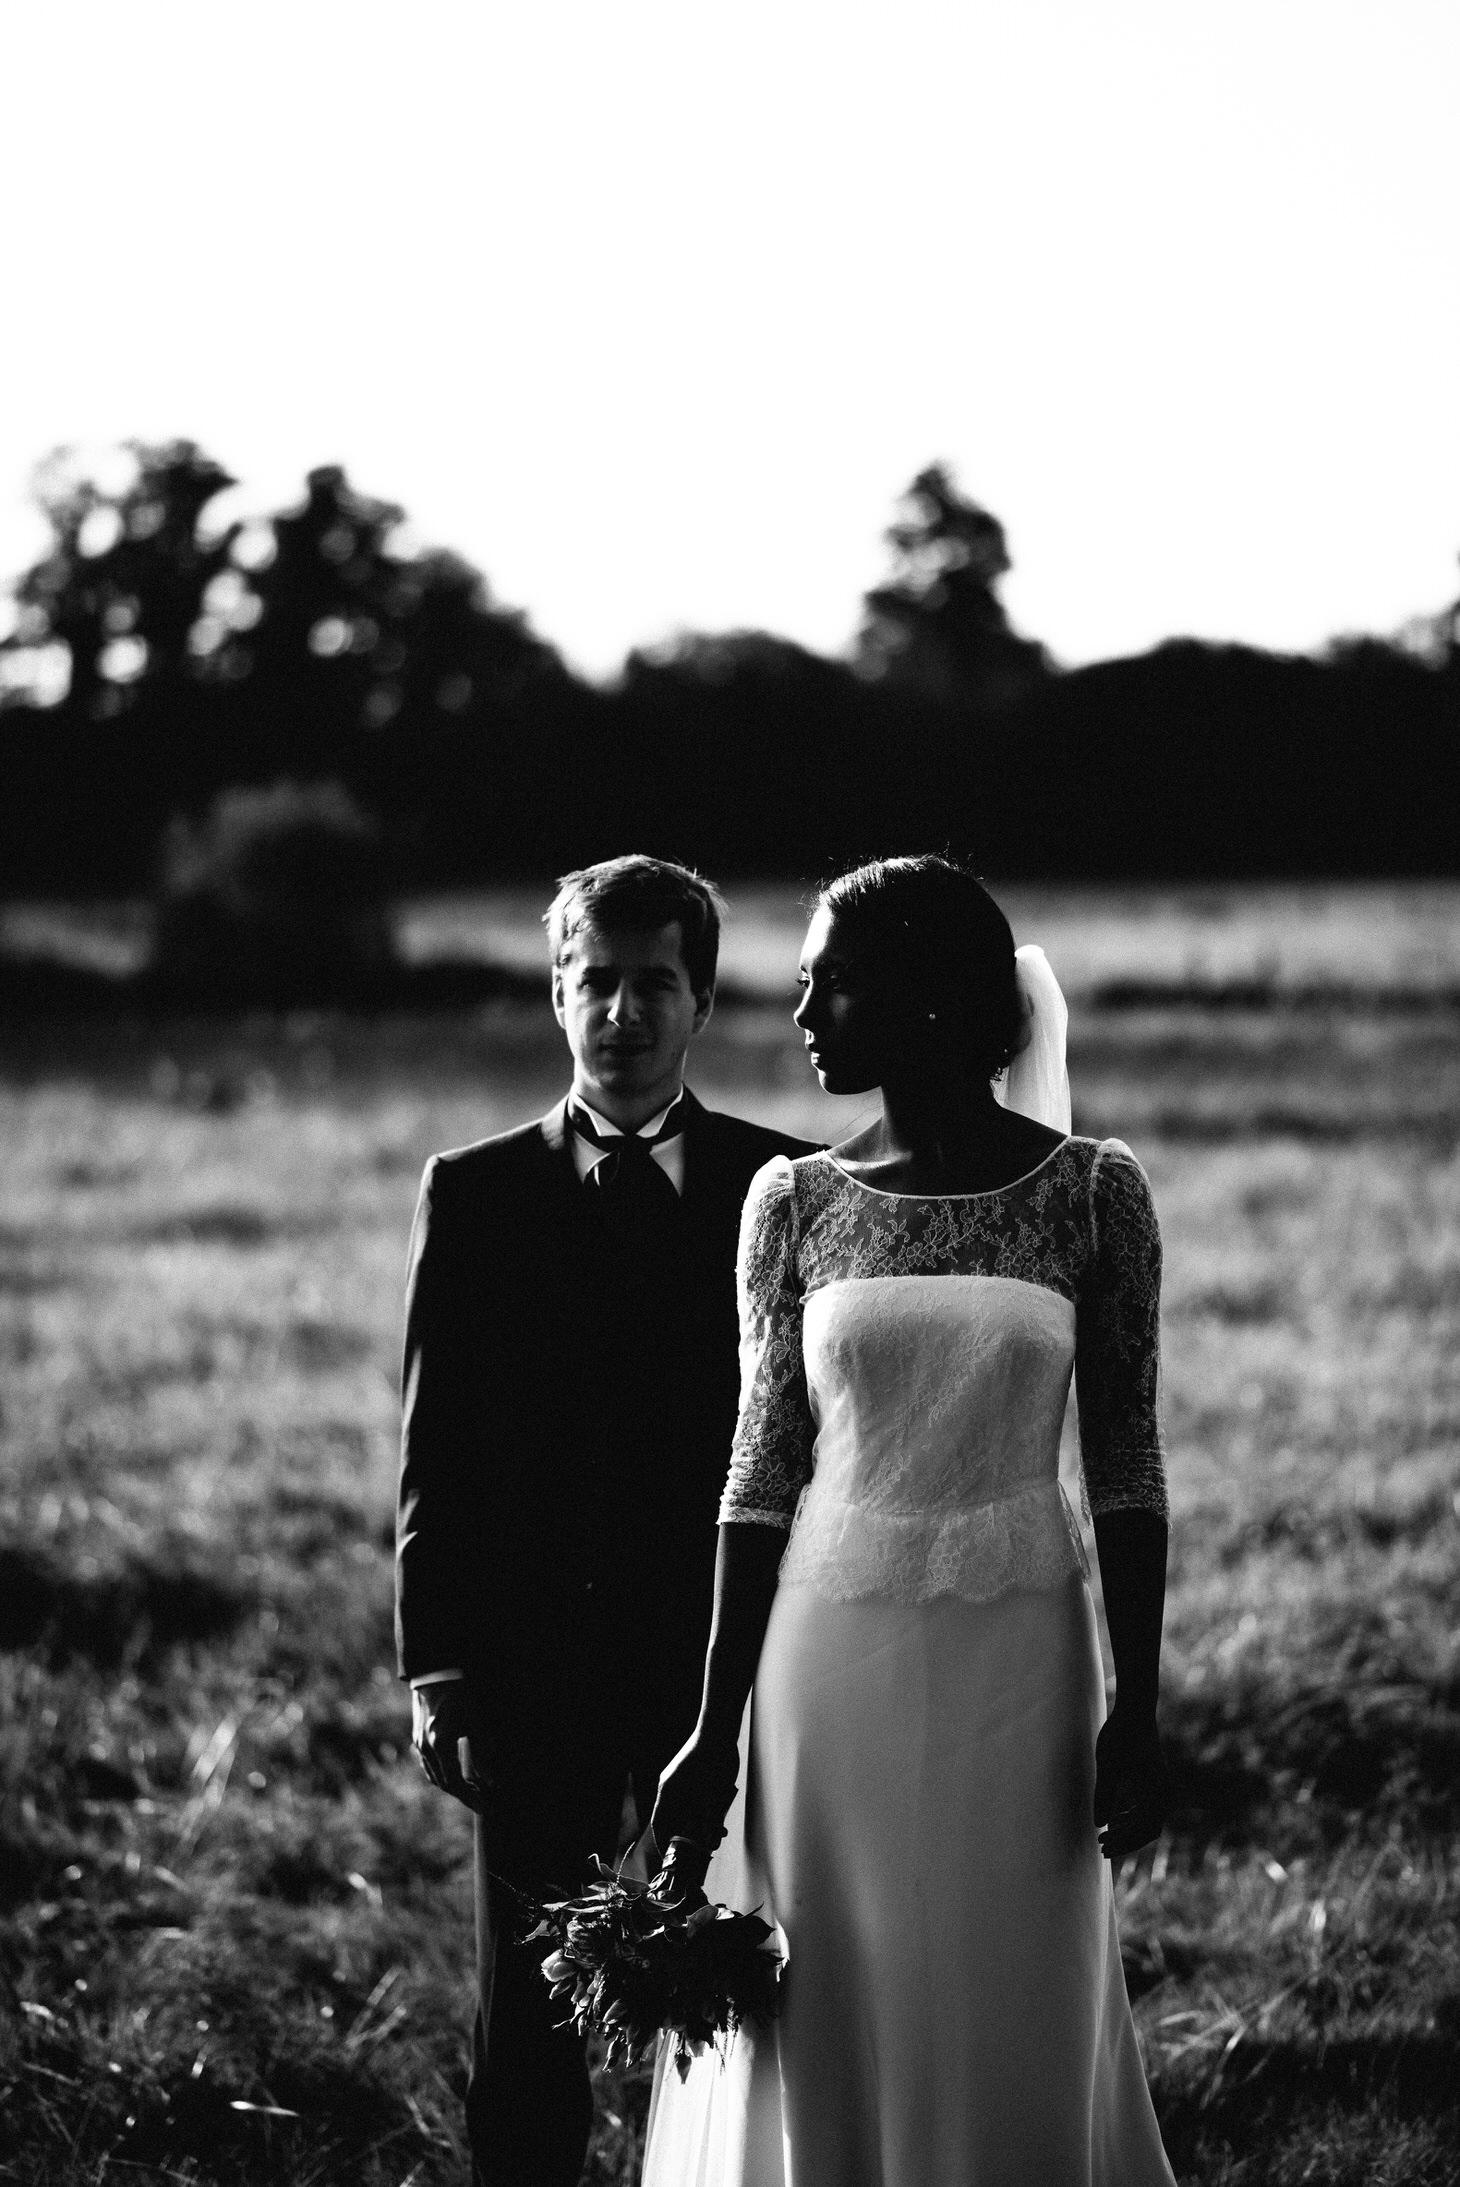 photographe-mariage-lyon-0539